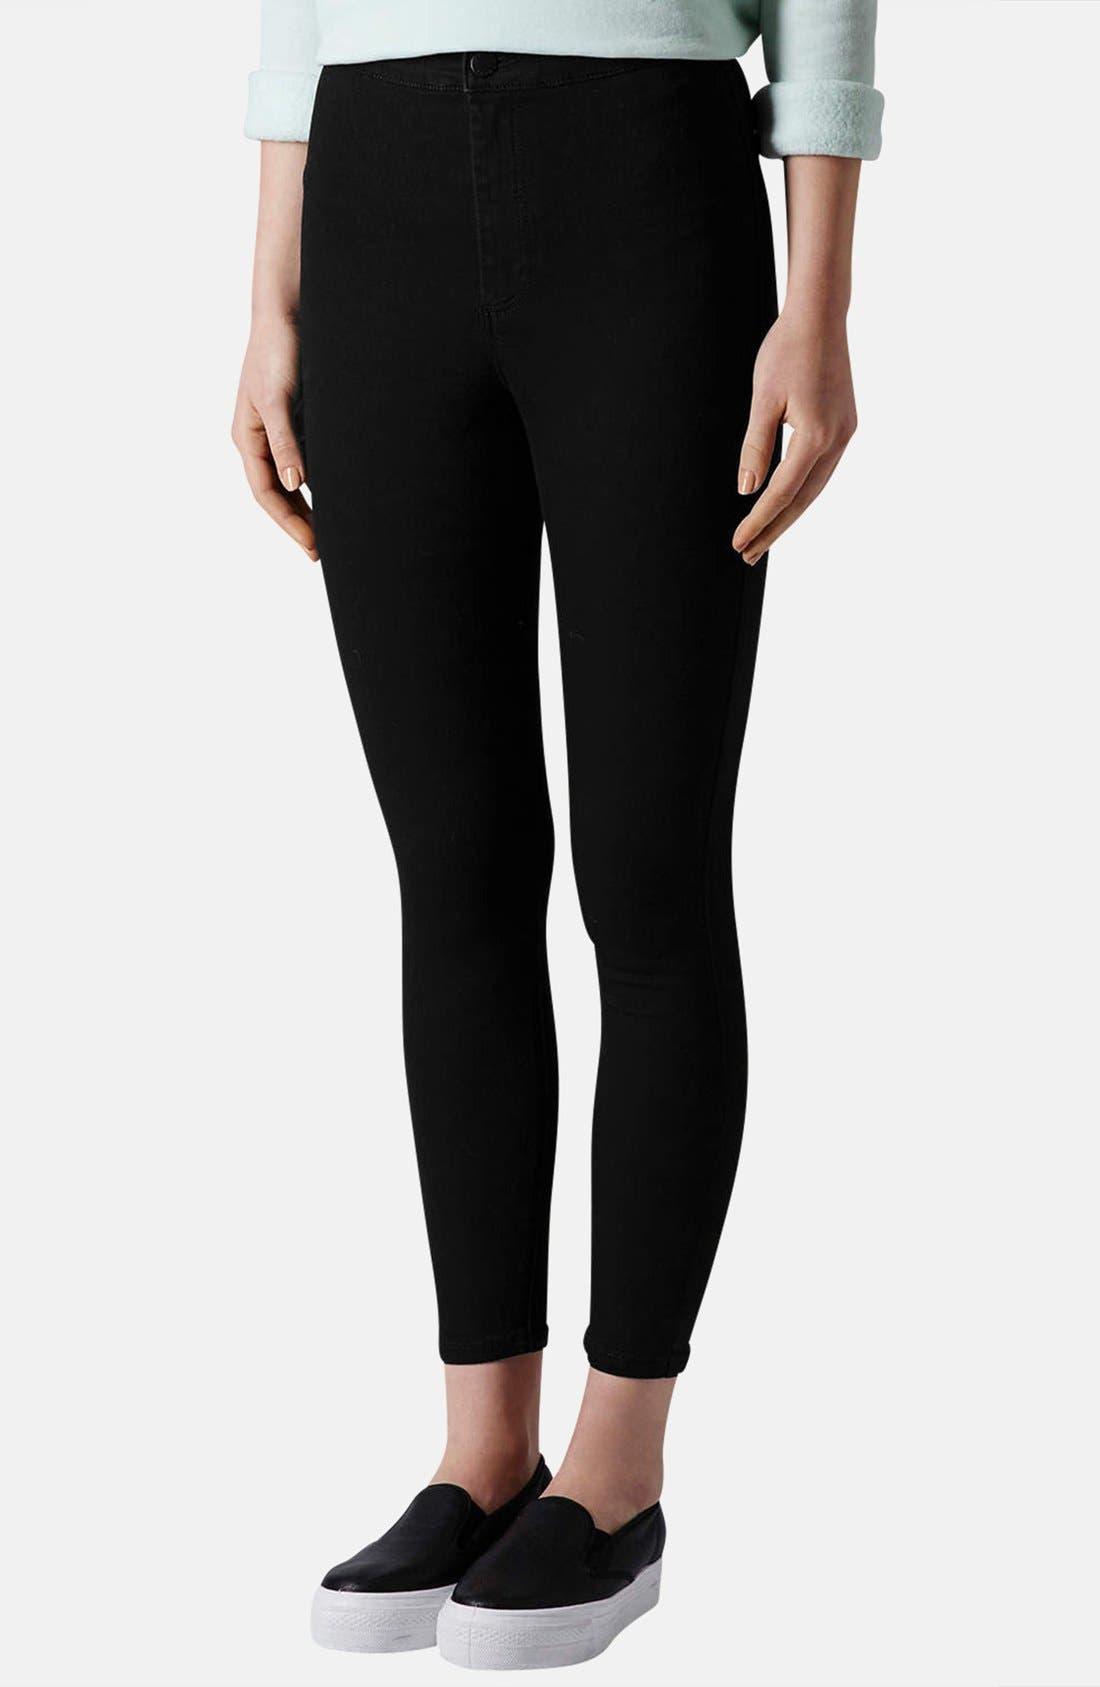 Alternate Image 1 Selected - Topshop Moto 'Joni' High Rise Skinny Jeans (Petite)